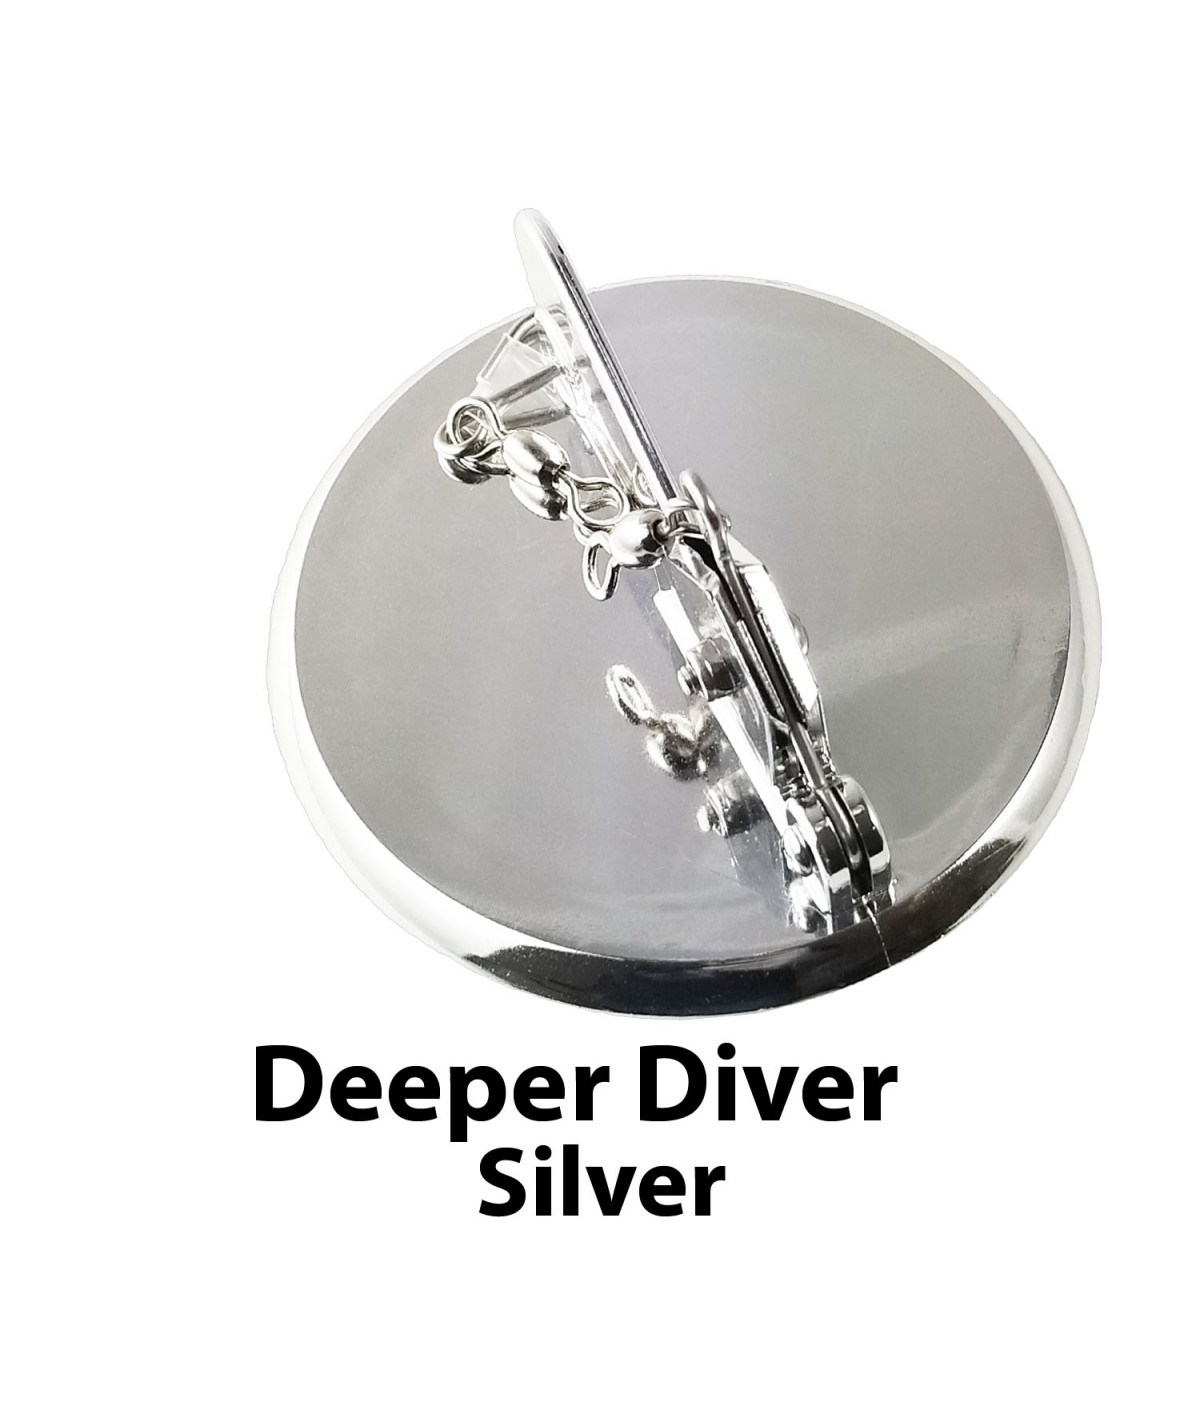 Deeper Diver 65mm Silver